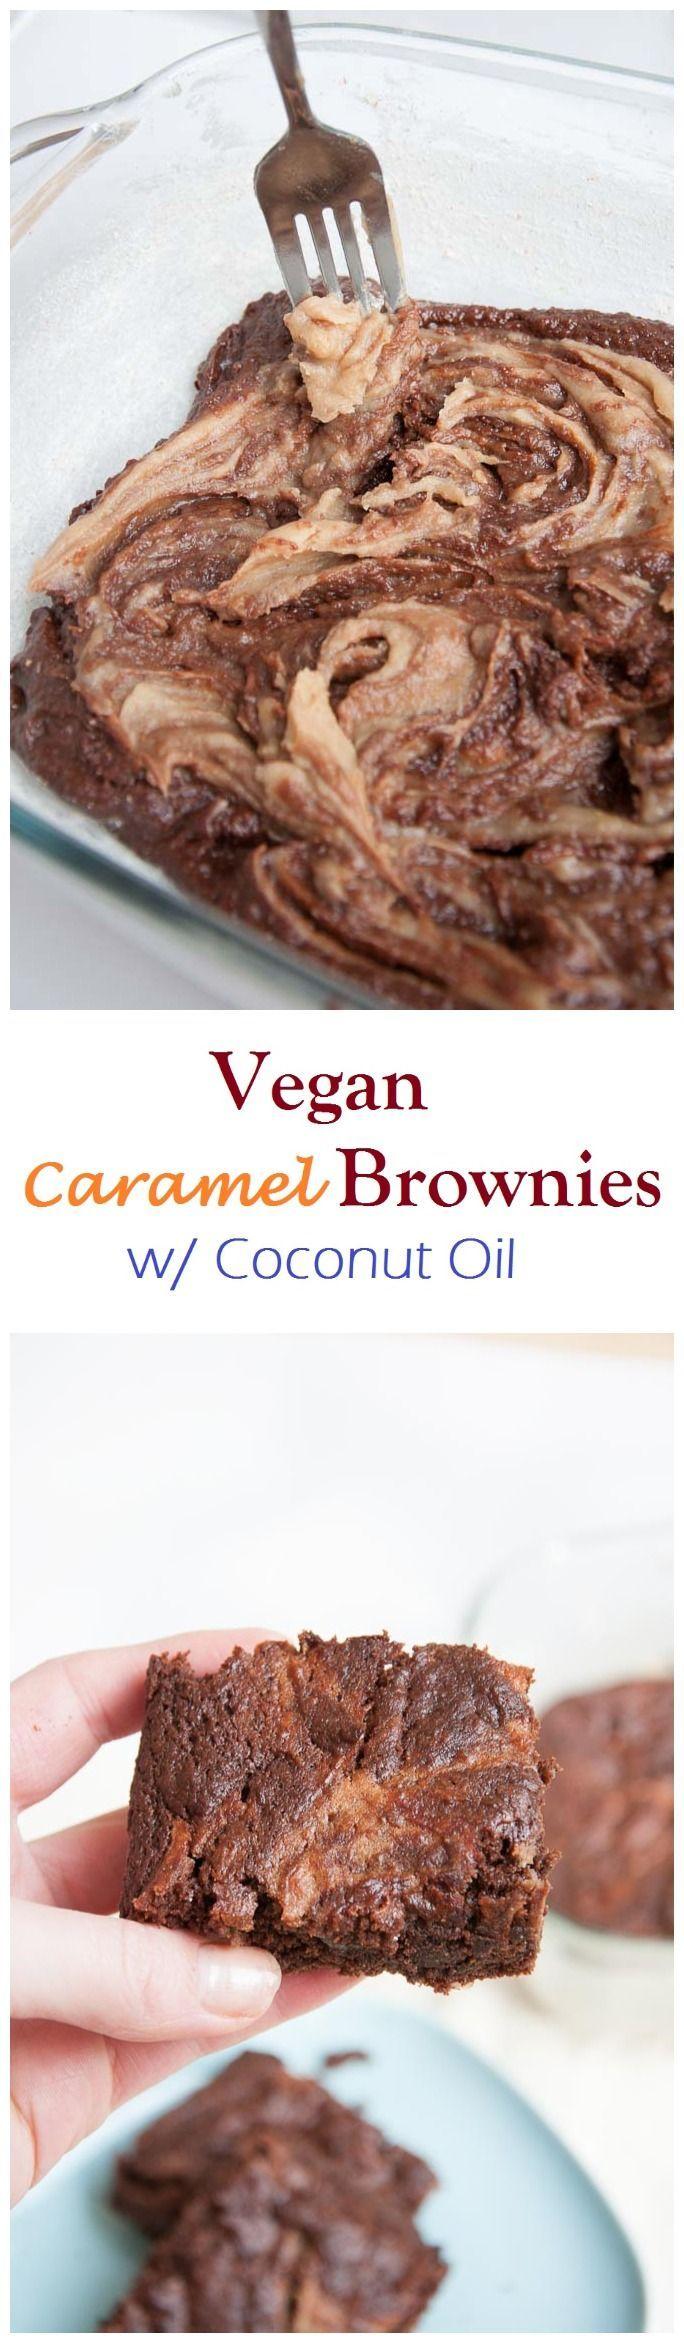 8 Ingredient Vegan Caramel Brownies Recipe w/ Coconut Oil and Homemade Raw Date Caramel   use gf flour